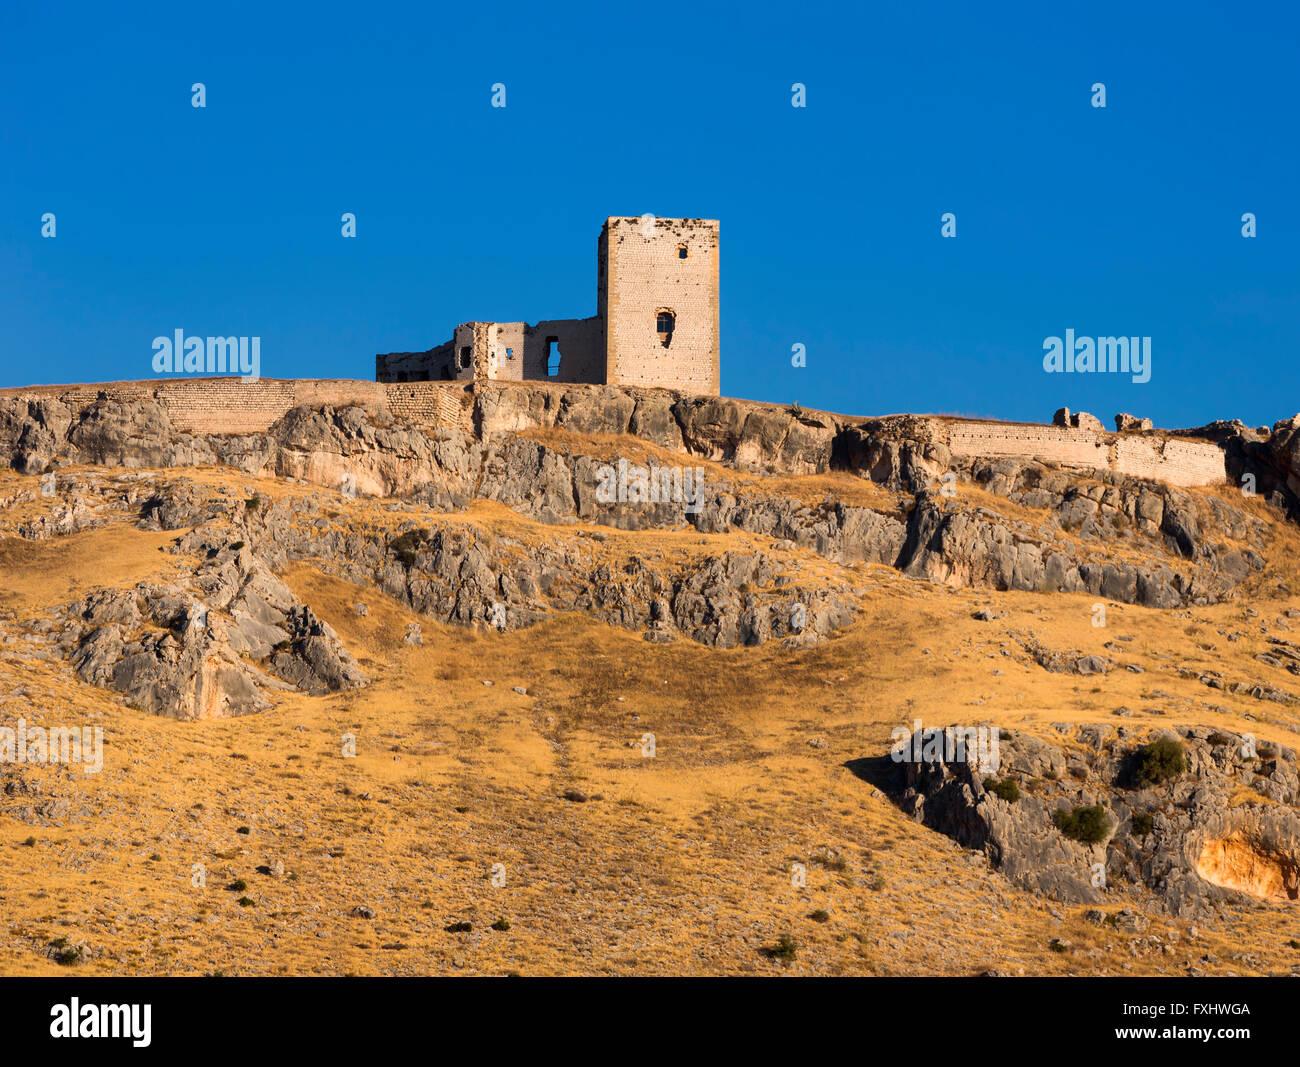 Teba, la province de Malaga, Andalousie, Espagne du sud. Château de l'étoile. Castillo de la Estrella Photo Stock